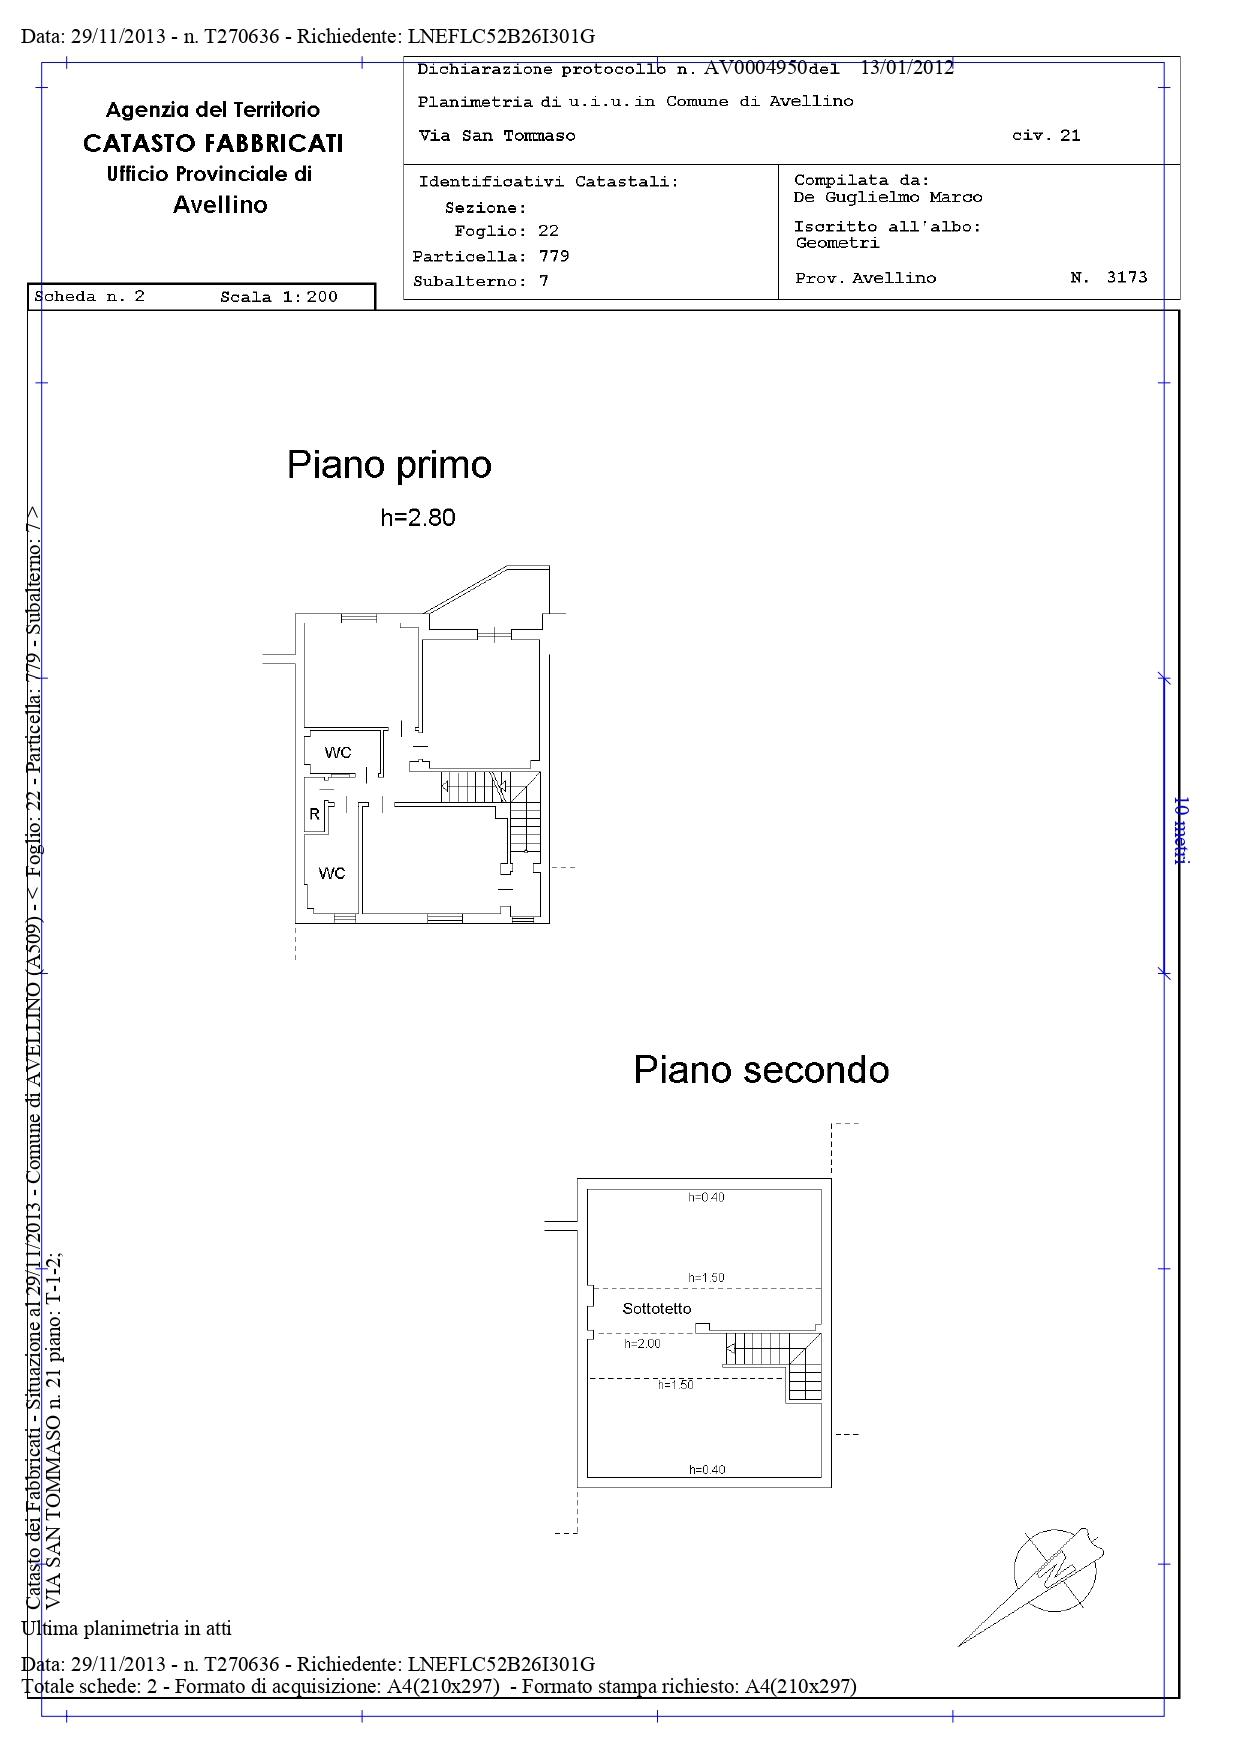 Planimetria Villa a Schiera De Peruta_page-0002.jpg